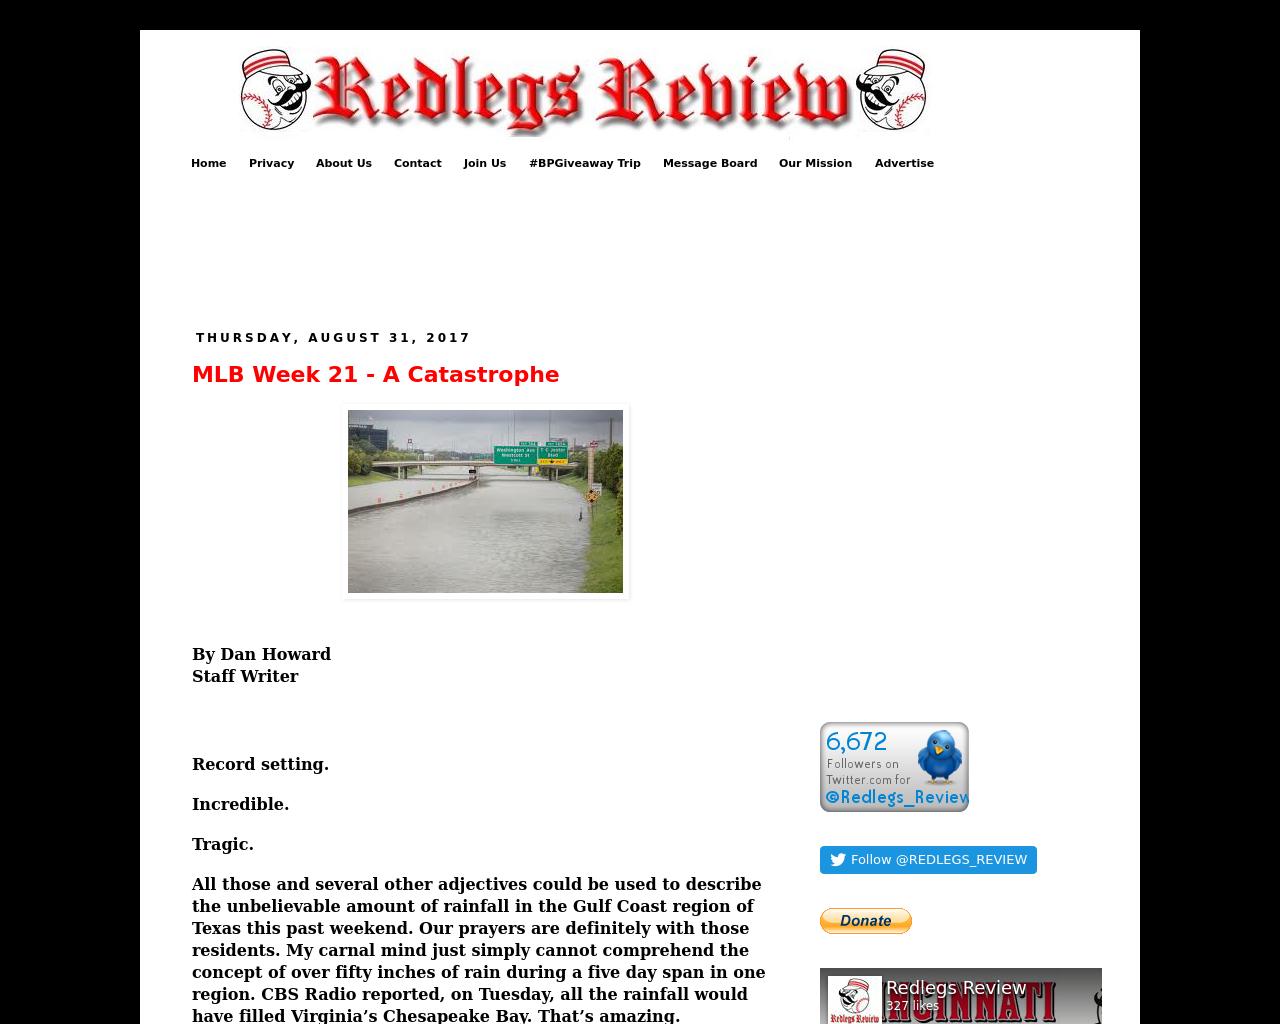 Redlegs-Review-Advertising-Reviews-Pricing